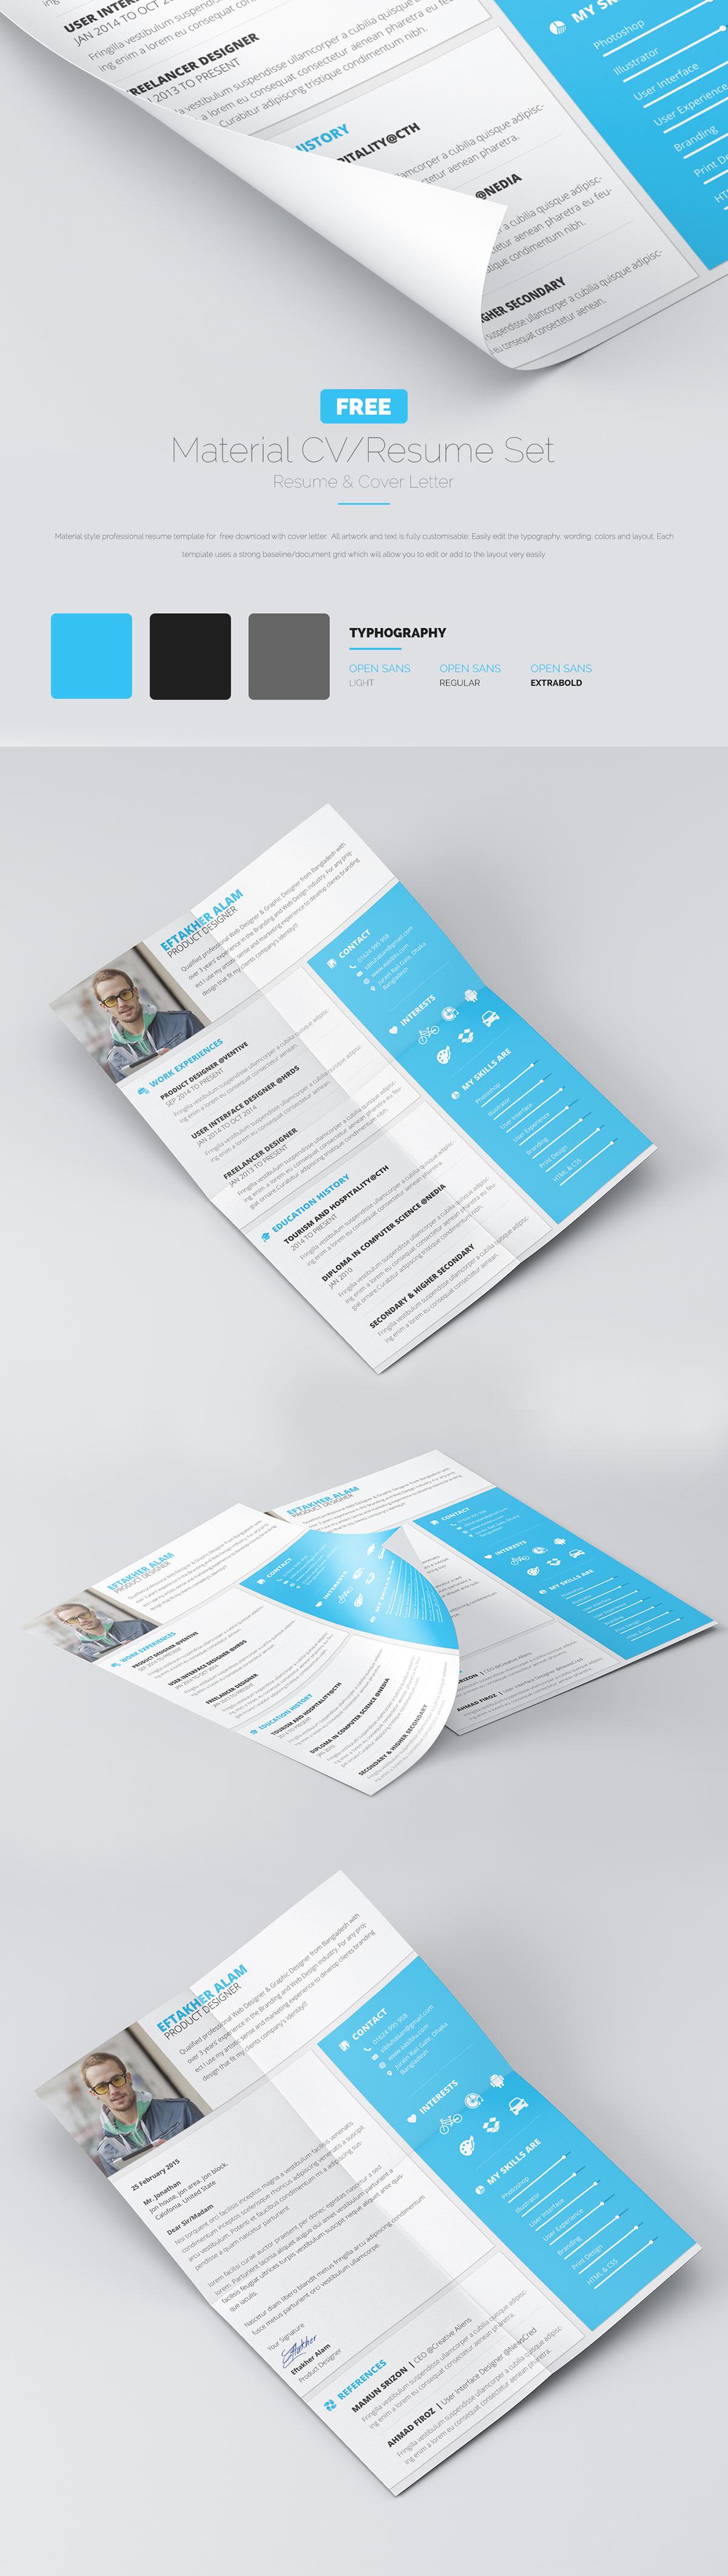 resume cv cover letter freebie copywriting graphic design print design